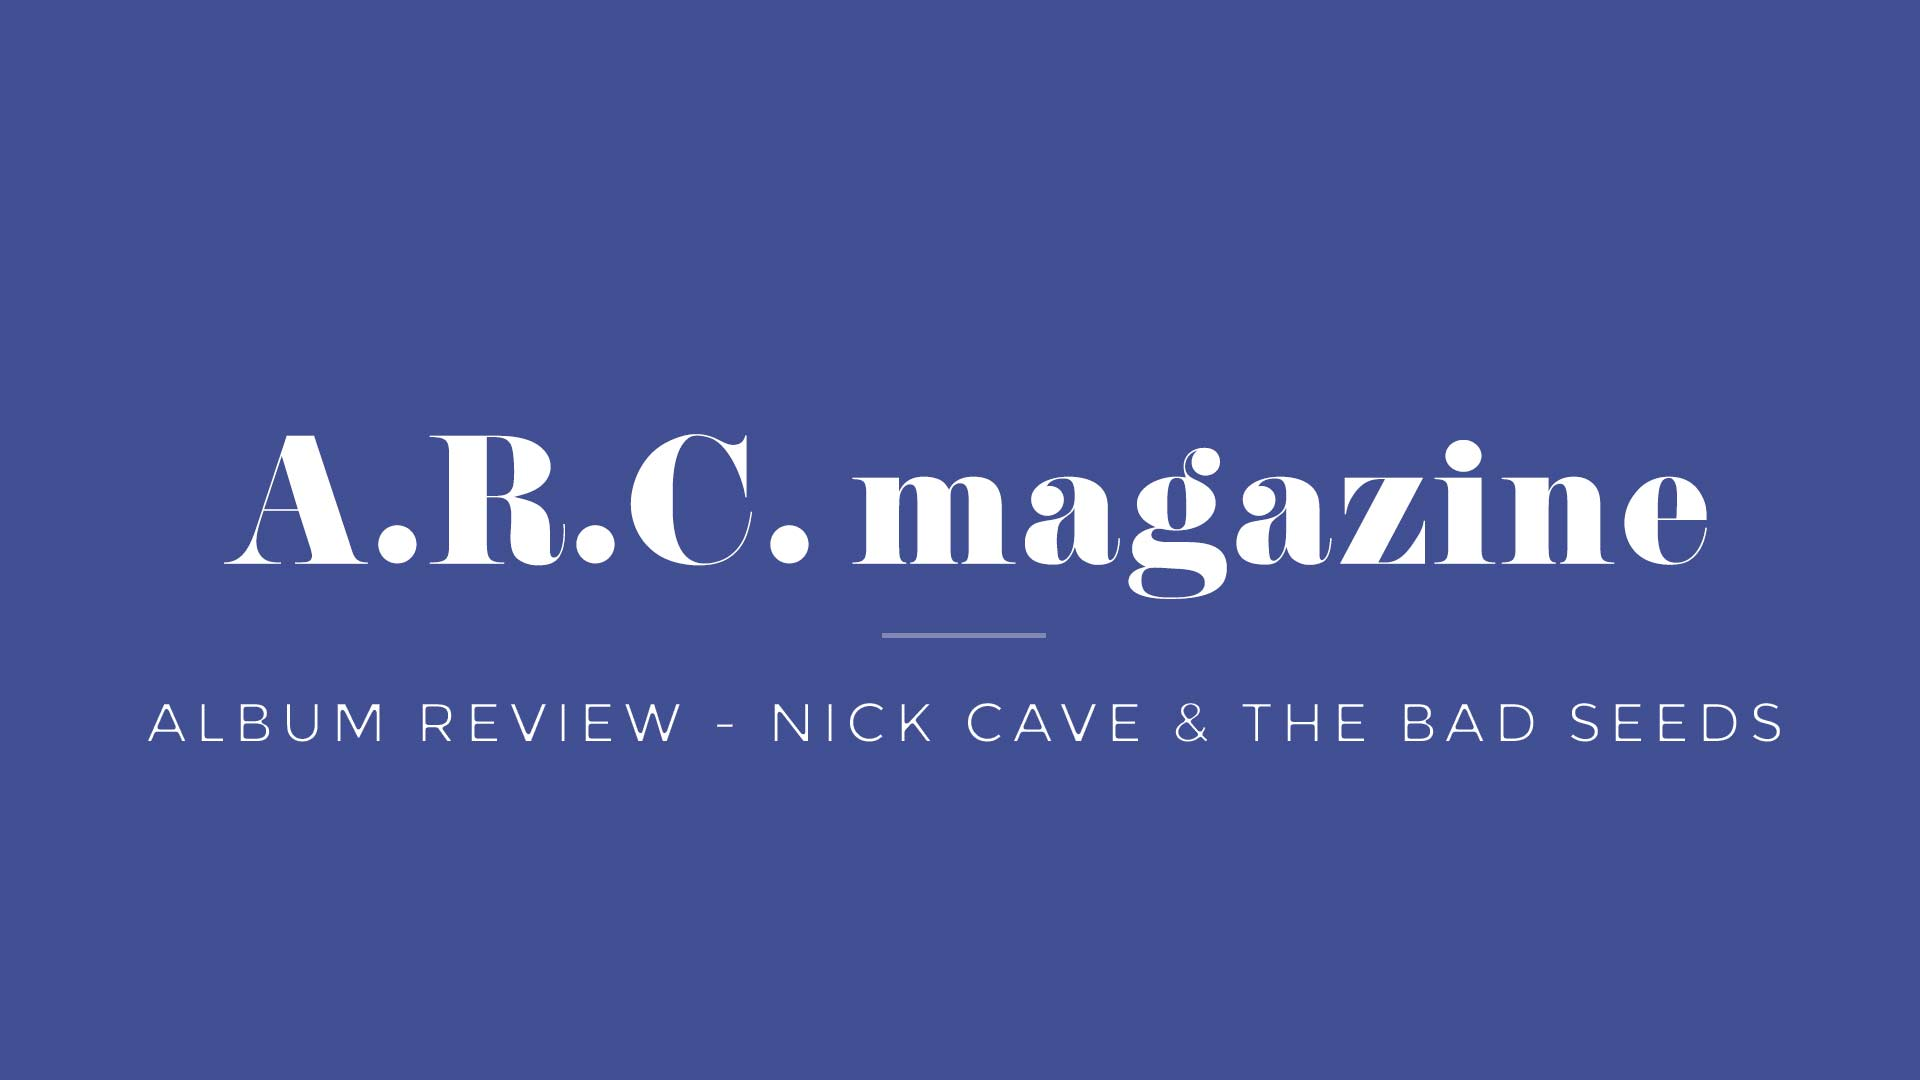 nickcave